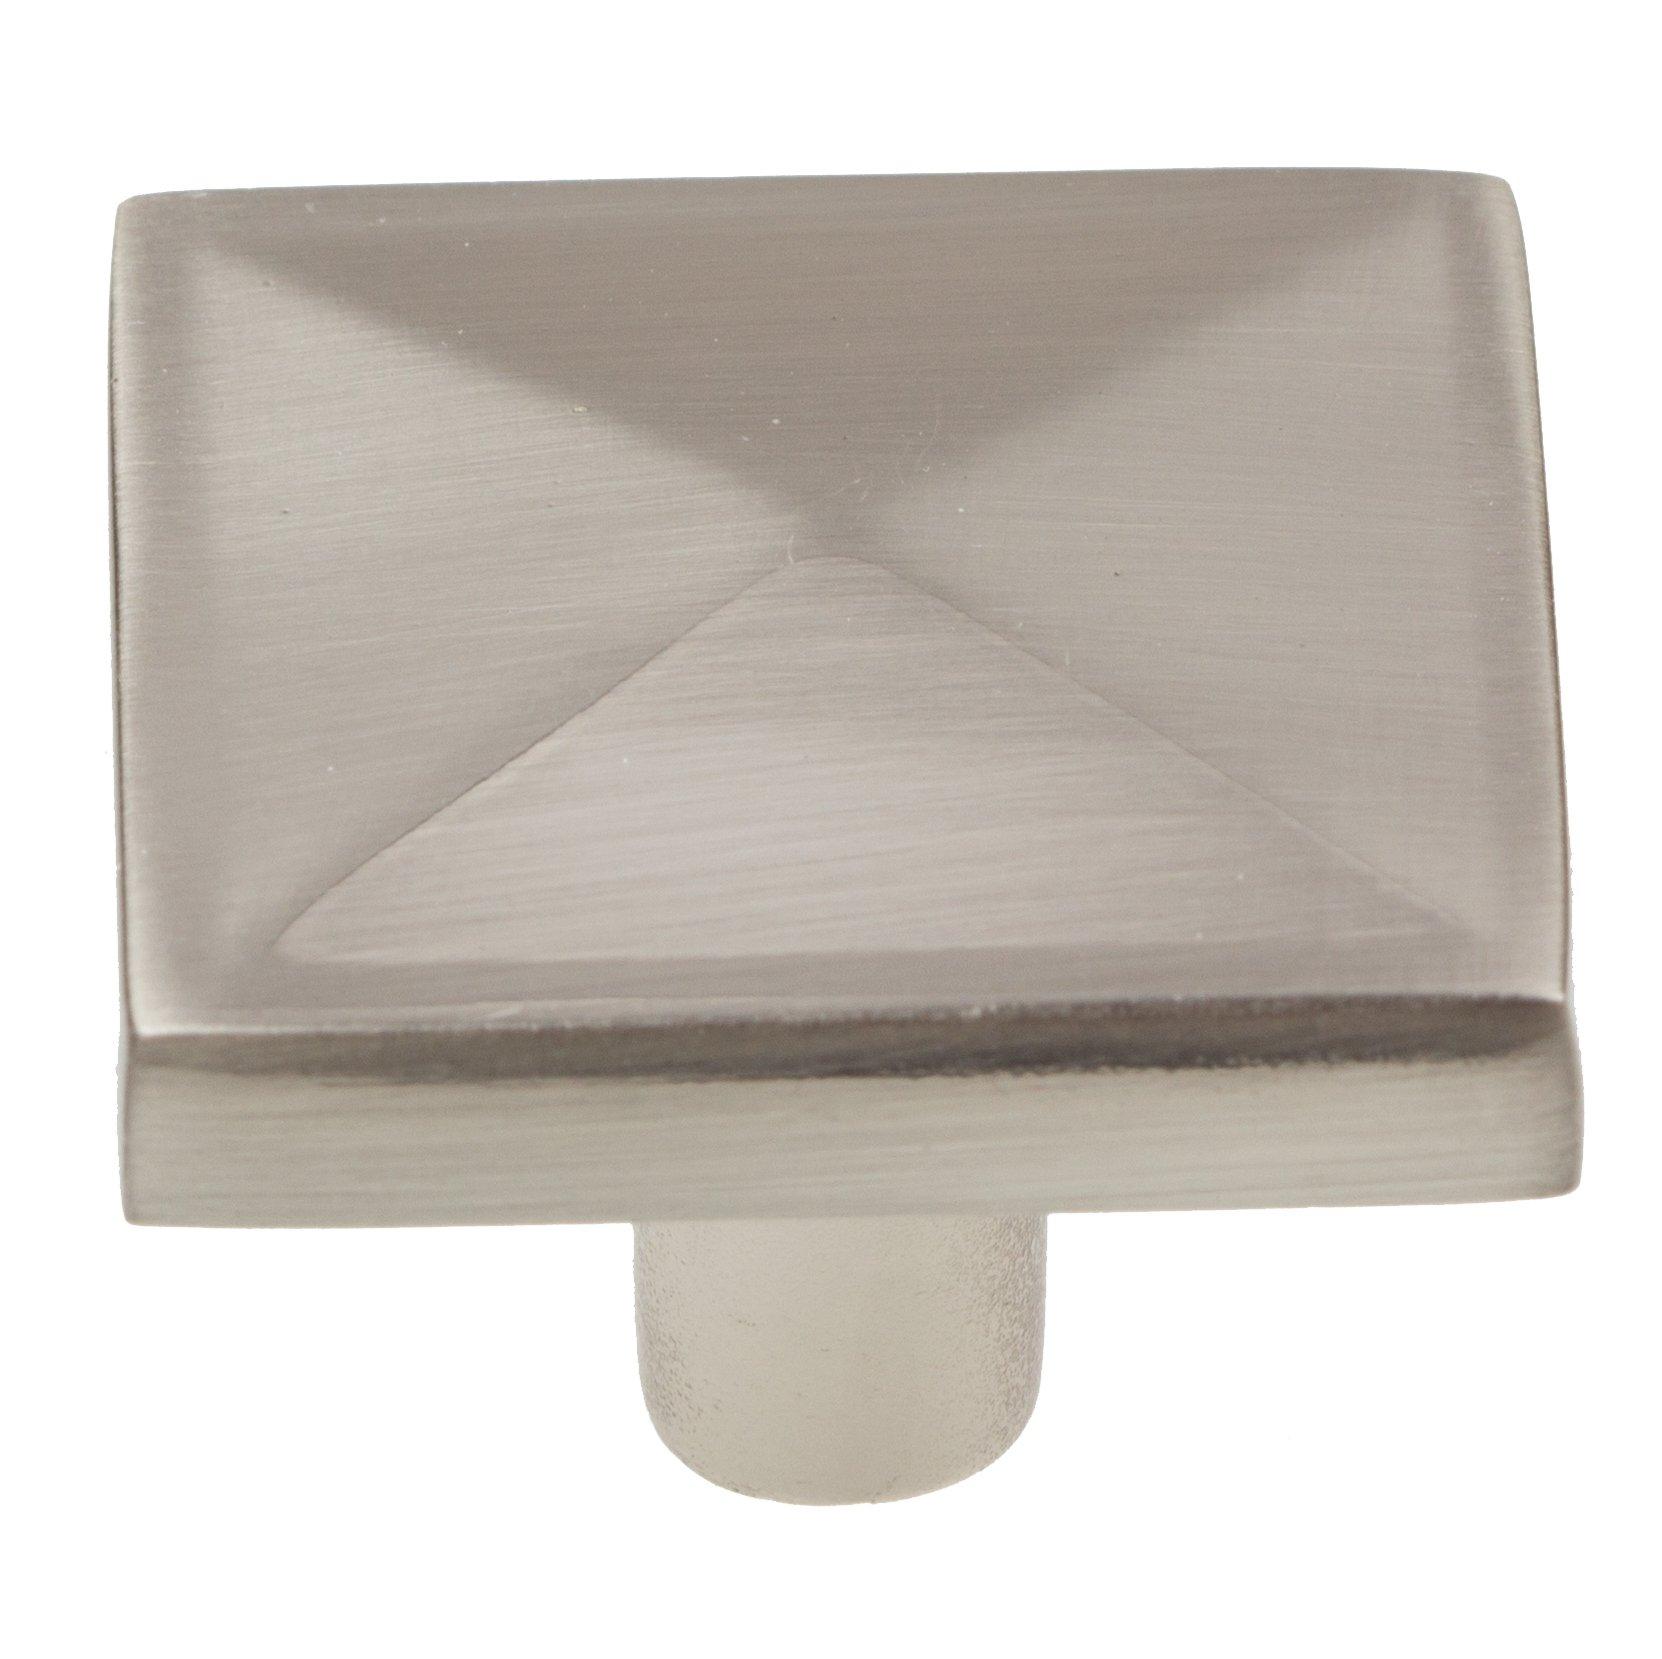 GlideRite Hardware 5207-SN-10 Square Knobs, 10 Pack, 1.25'', Satin Nickel